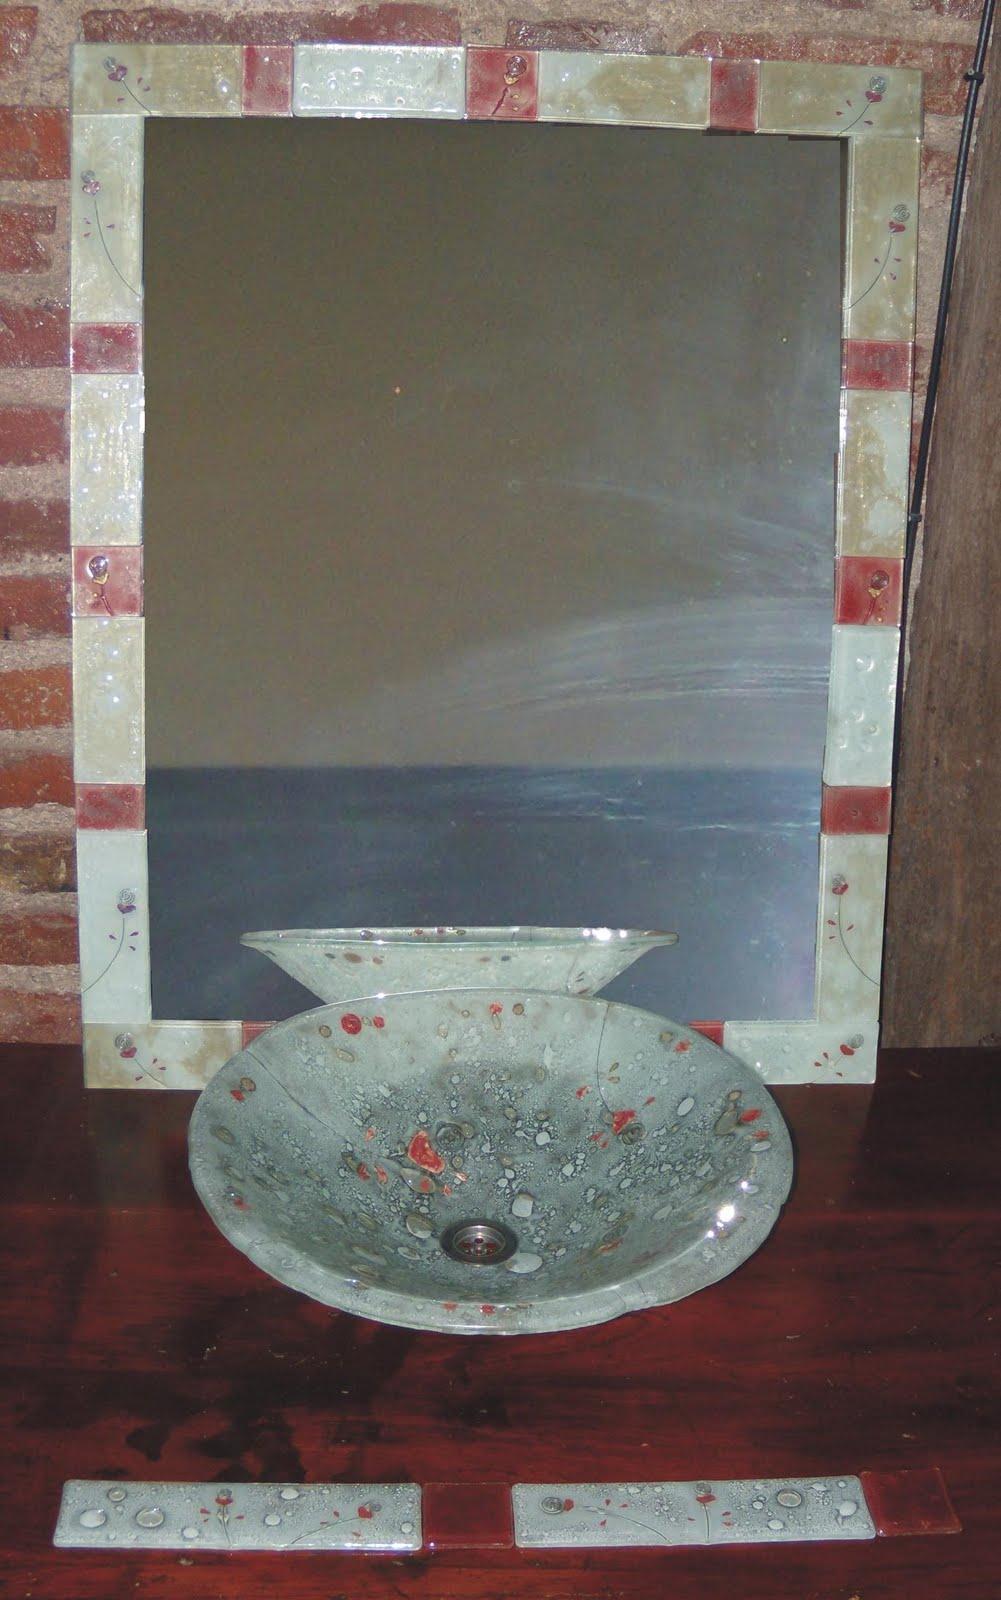 Bachas Para Baño Nuevas:senestrari vitreaux: Conjunto Baño bacha + espejo + guarda